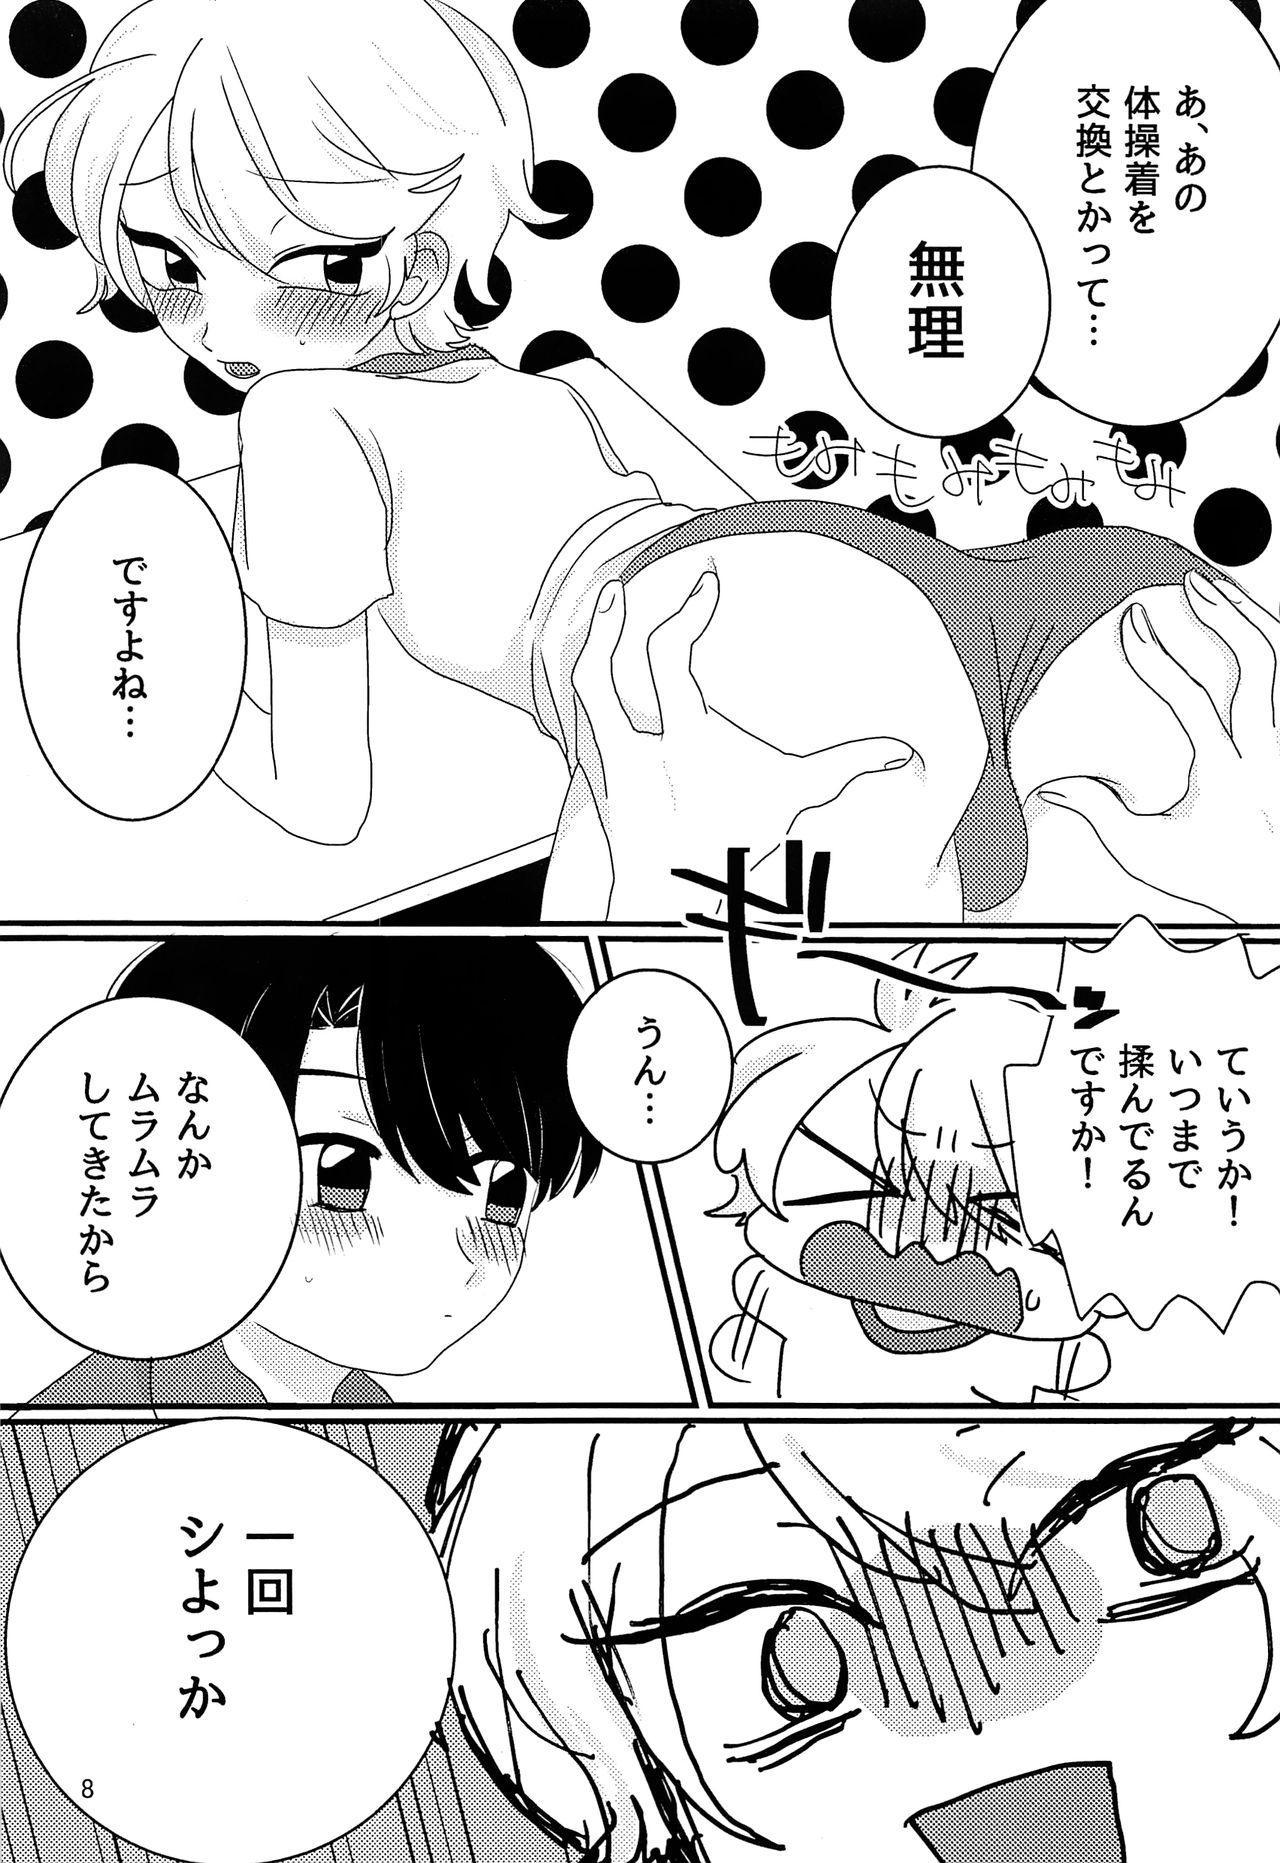 Taisougi wa ii ne. 6